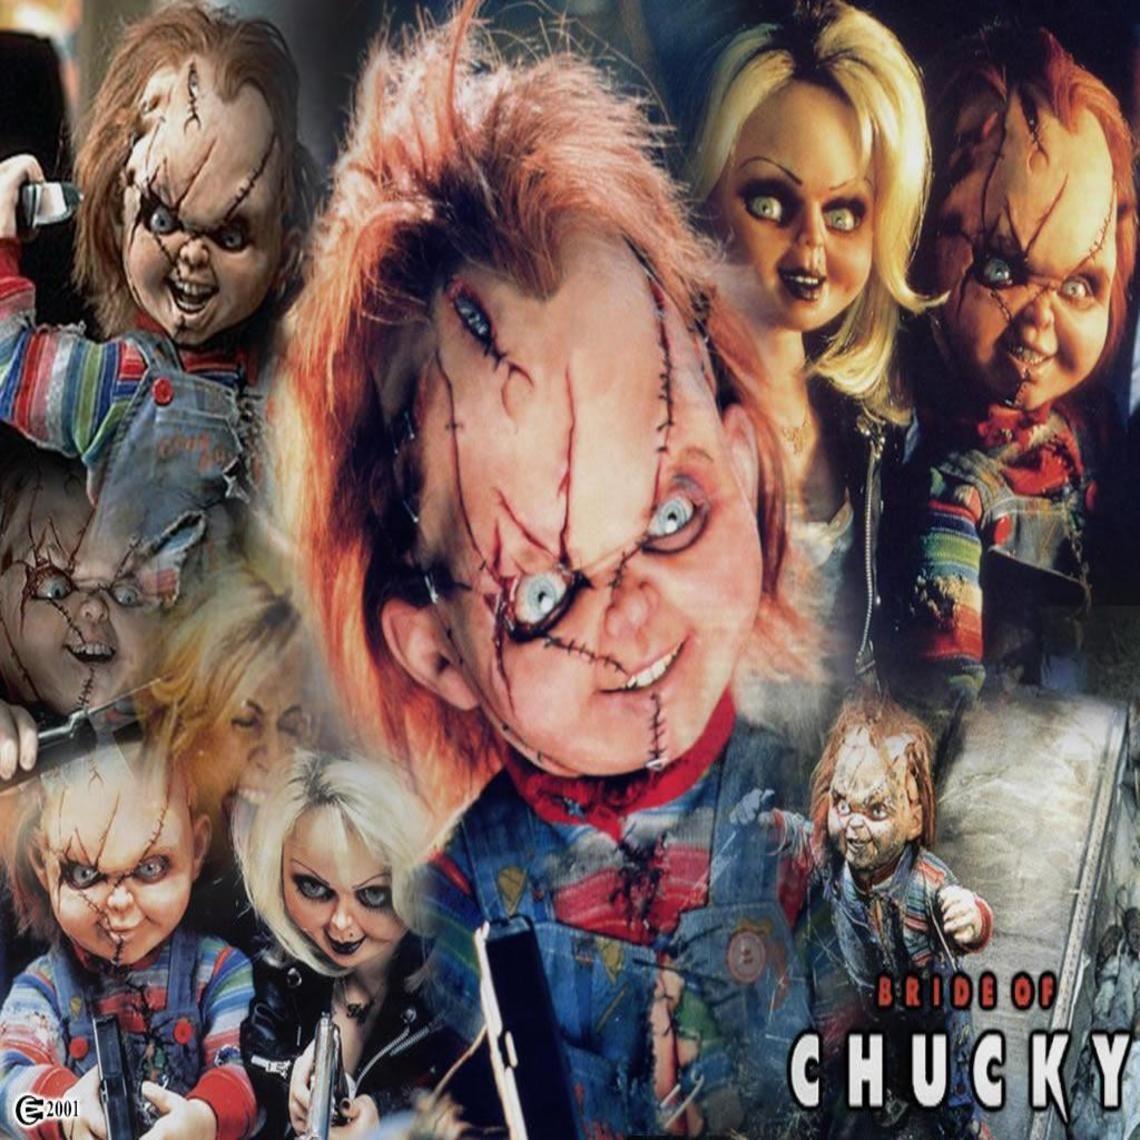 Bride of Chucky Chucky, Bride of chucky, Chucky movies